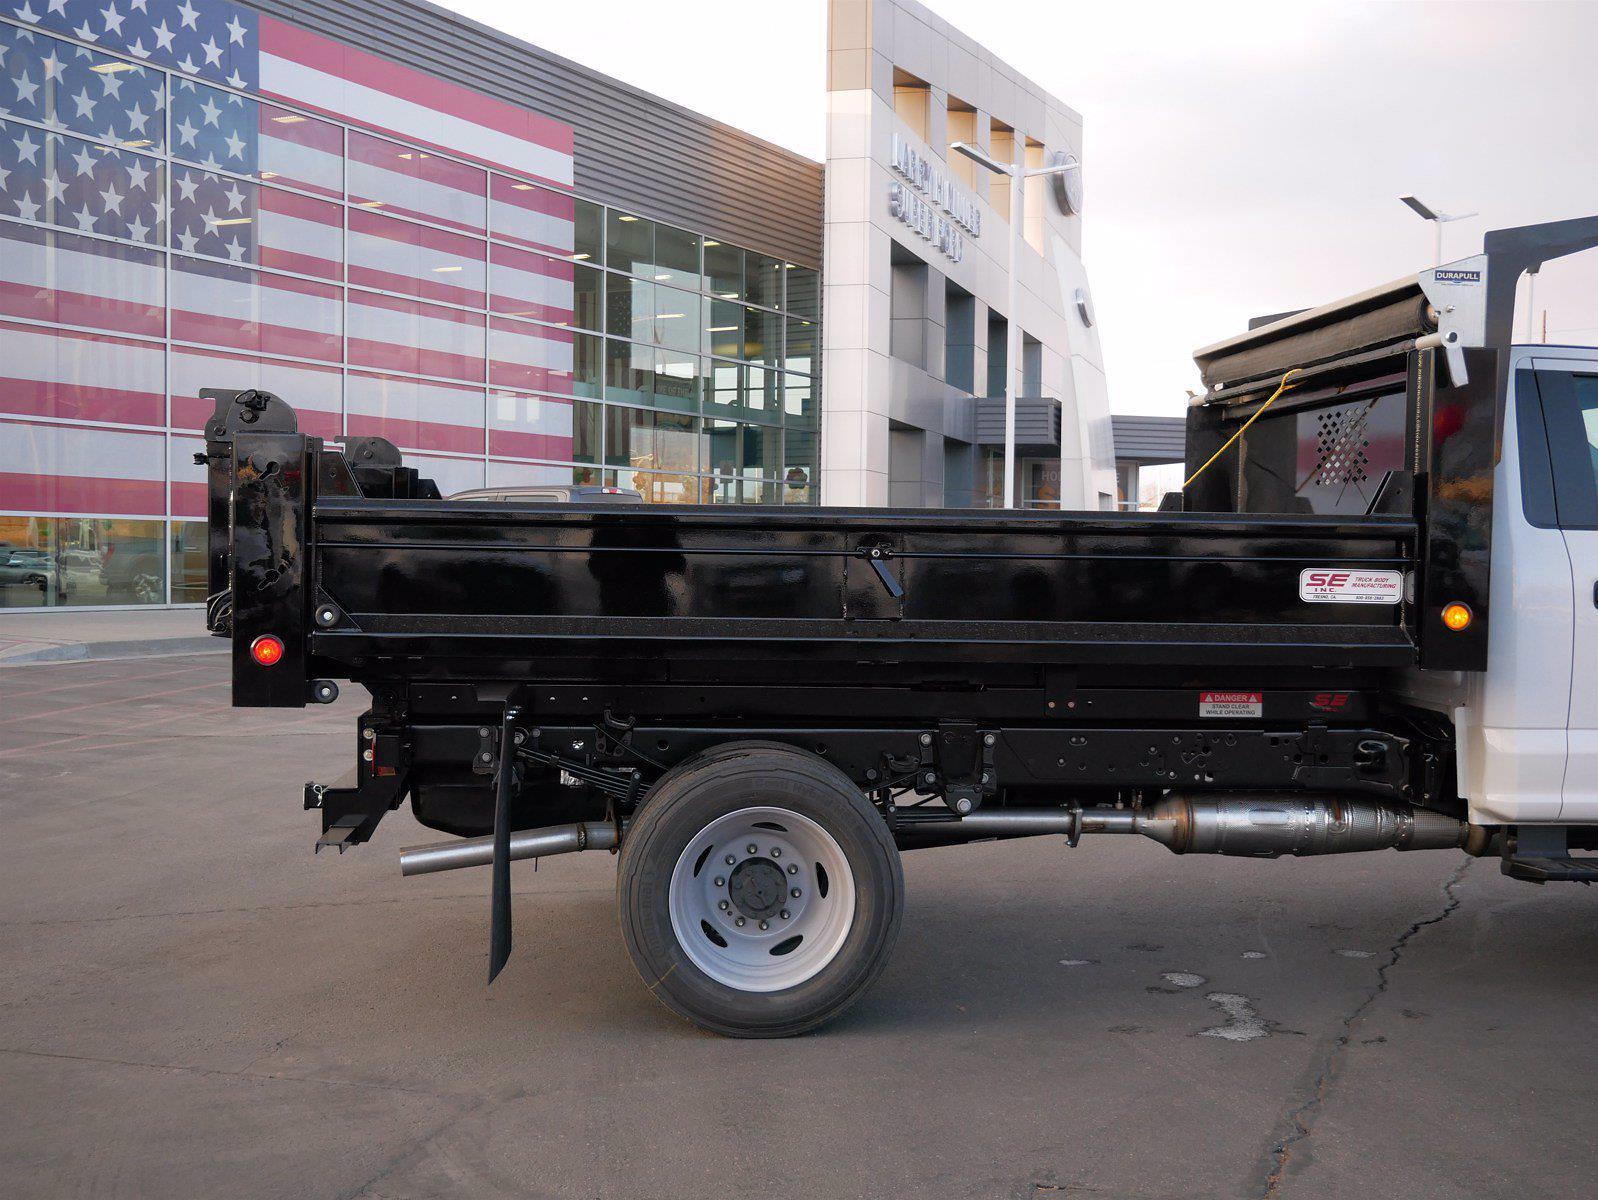 2020 Ford F-550 Regular Cab DRW AWD, Scelzi Dump Body #63233 - photo 10